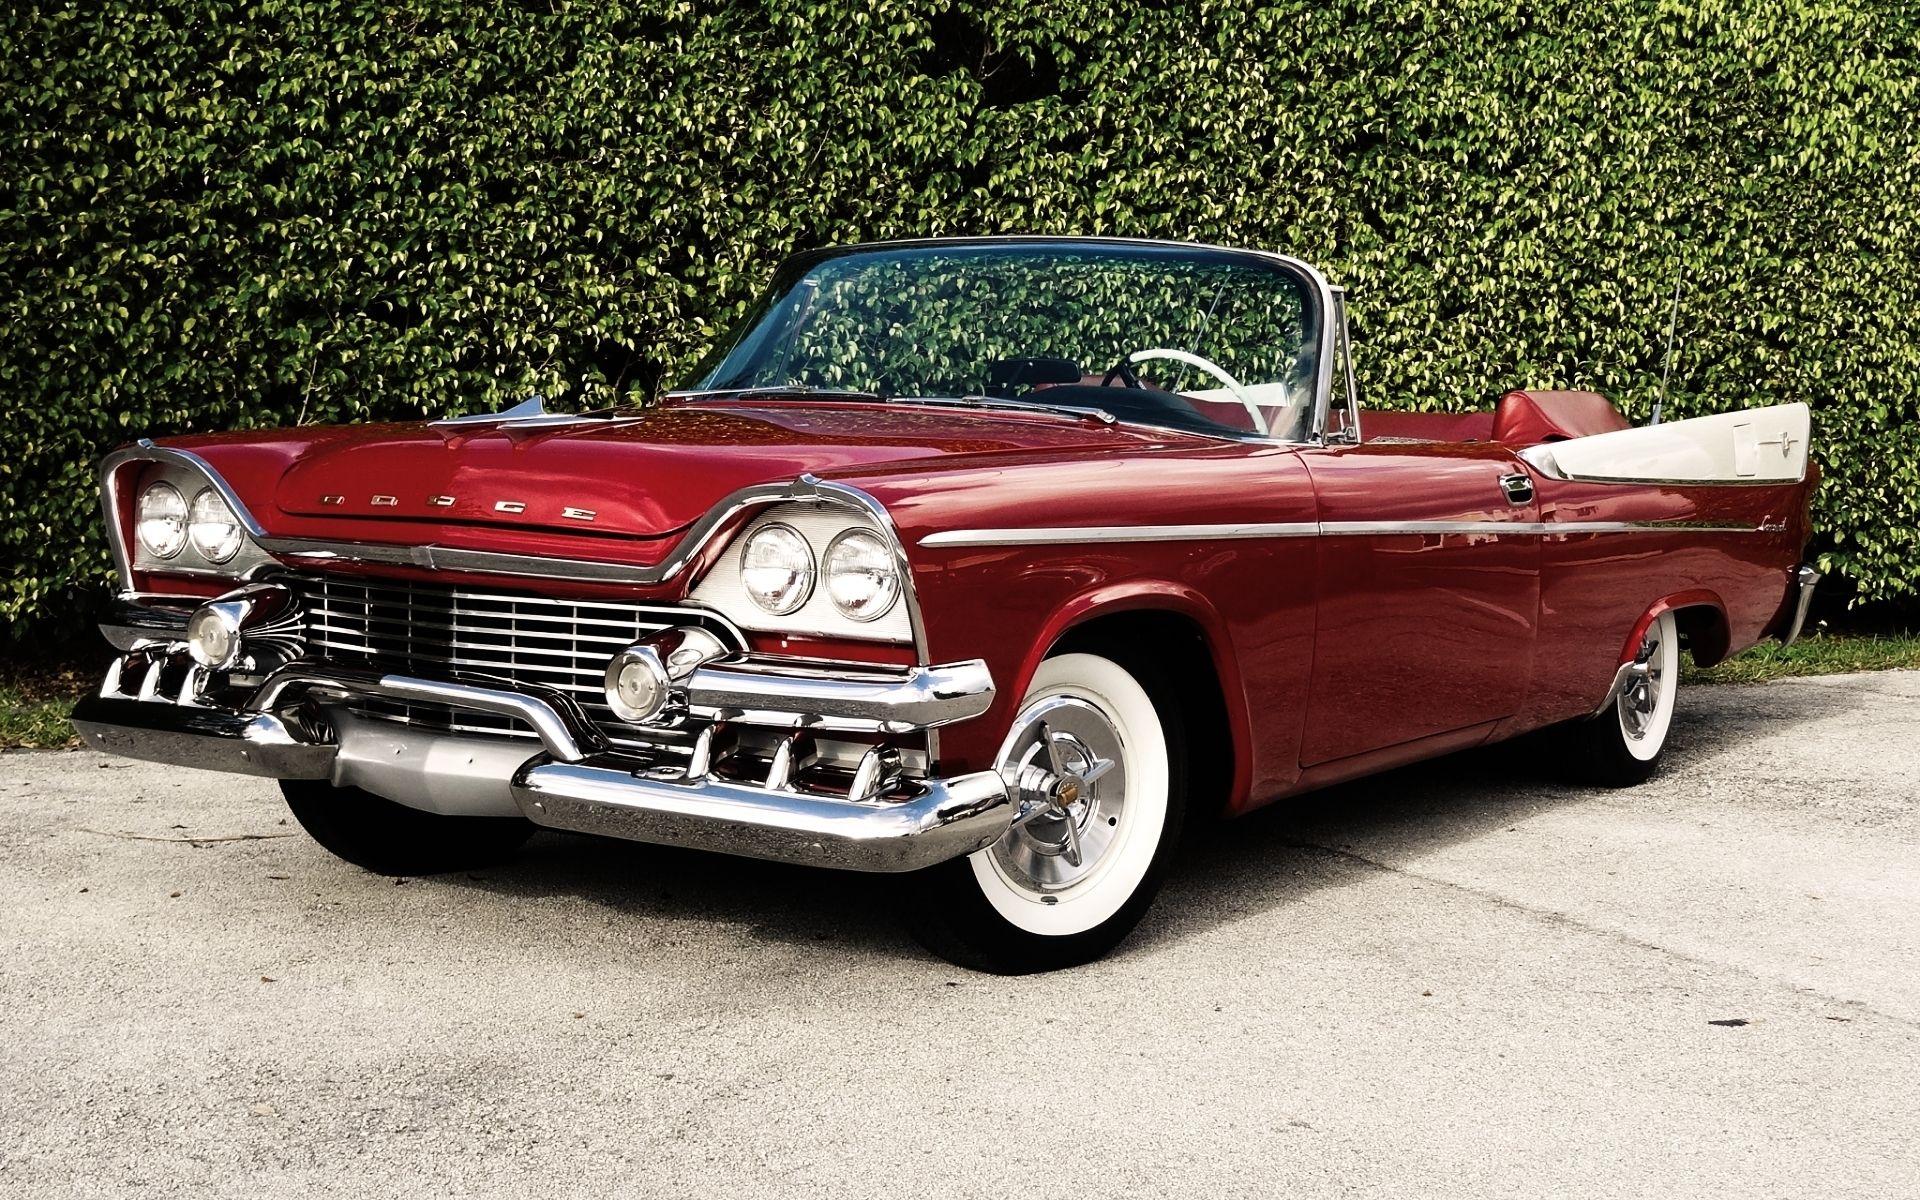 1958 Dodge Classic Cars  CUHD  Mopar  Pinterest  Dodge and